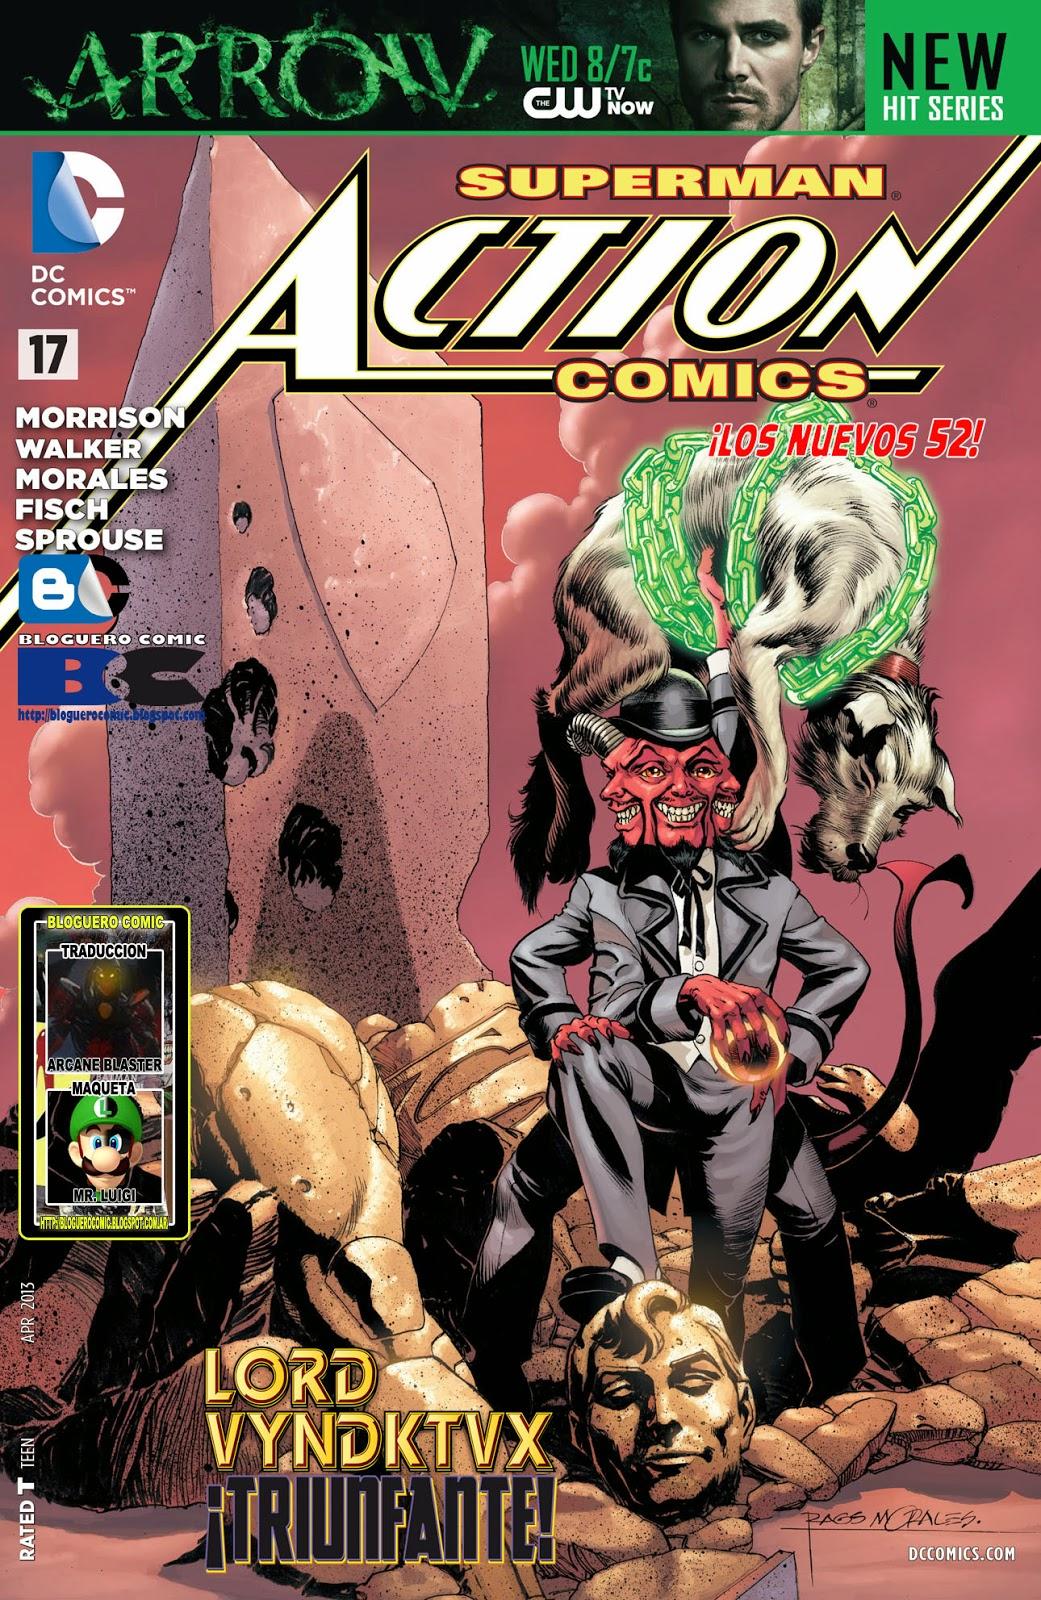 http://www.mediafire.com/download/3jcktm1r56m2nq6/Action+Comics+17+%28Bloguero+Arcane+Blaster+-+Mr.+Luigi%29.cbr